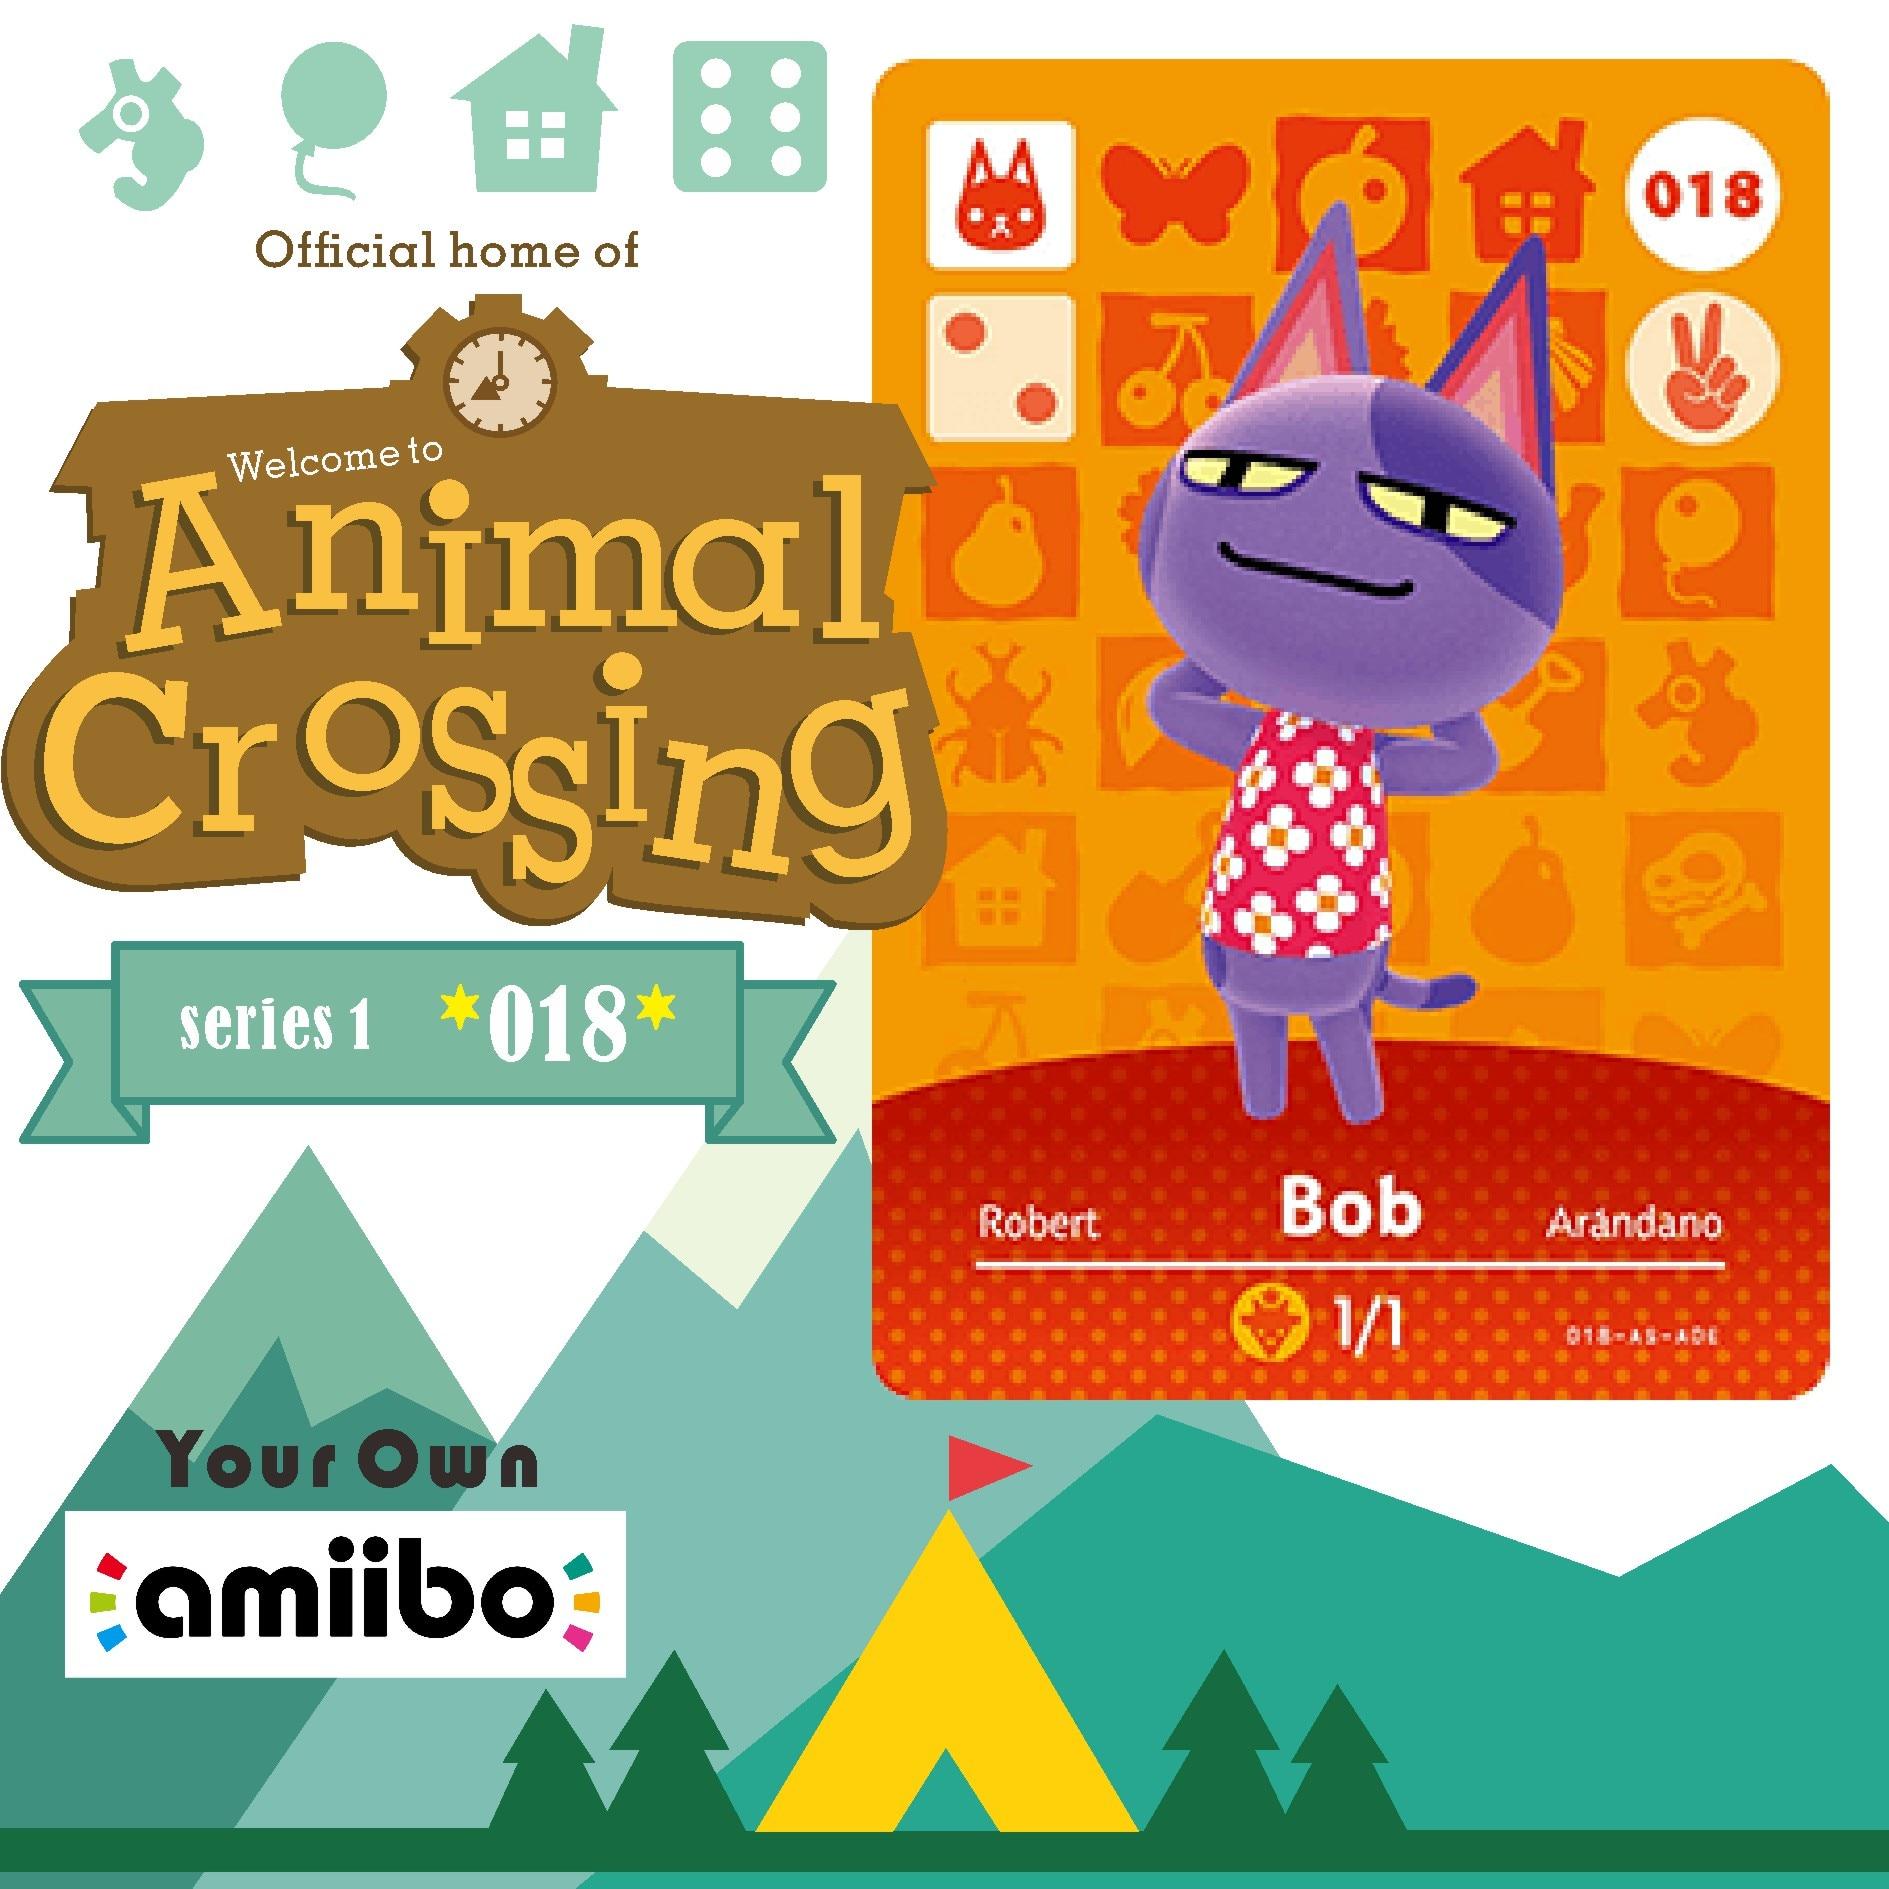 018 Arándano Animal Crossing Cruz tarjeta TARJETA DE Amiibo Animal Crossing tarjeta de juego nuevos horizontes de Animal Crossing Bienvenido Amiibo